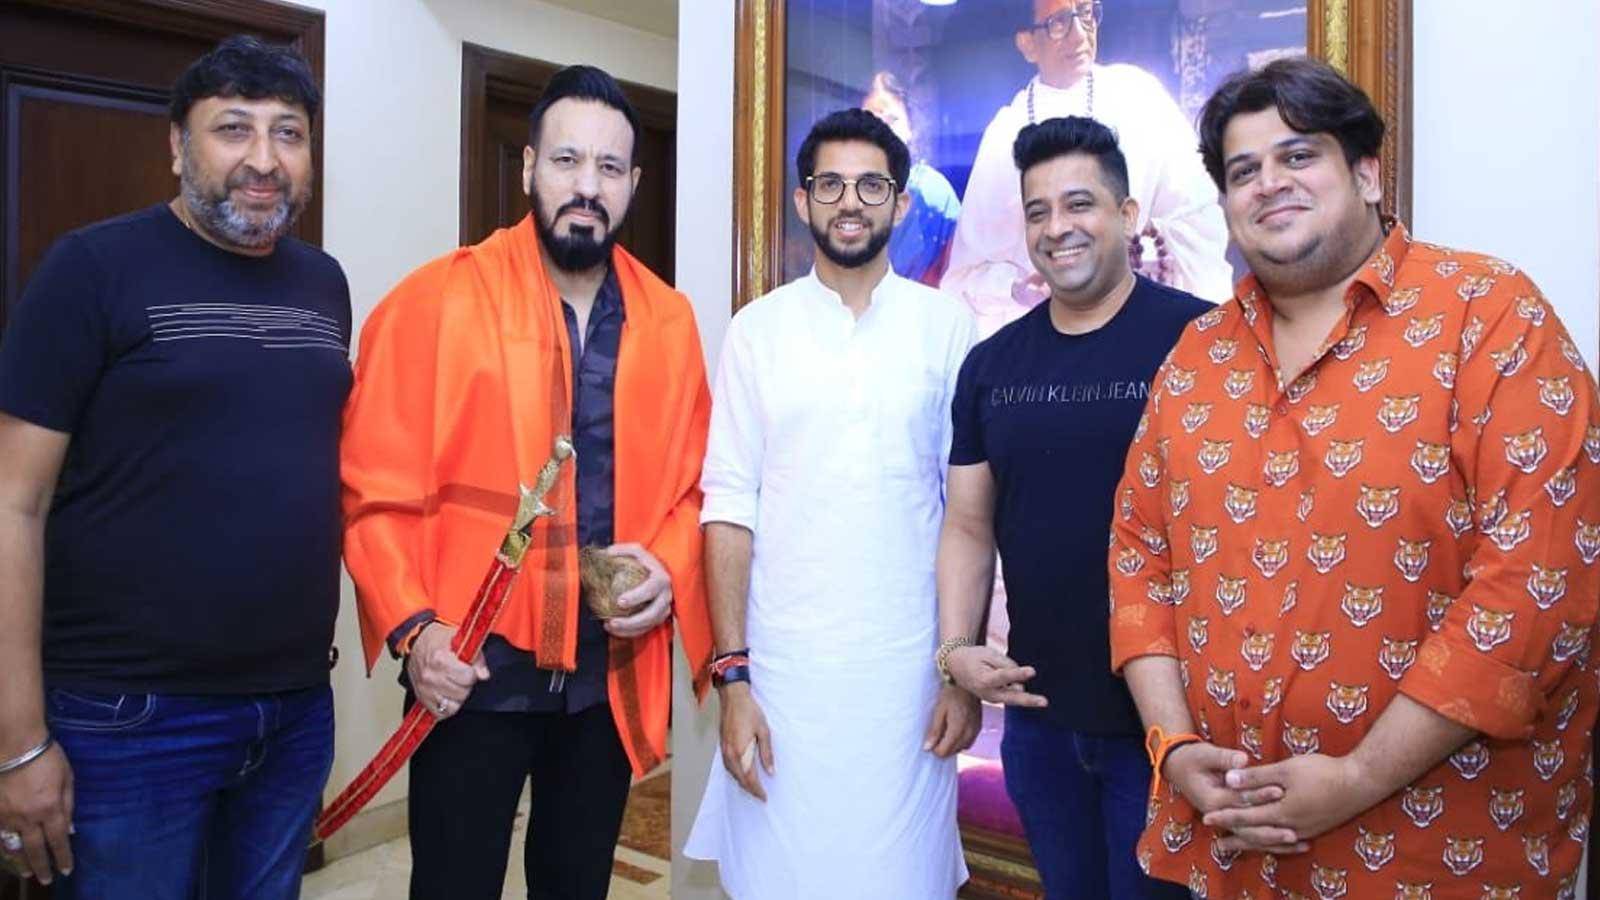 salman-khans-bodyguard-shera-joins-shiv-sena